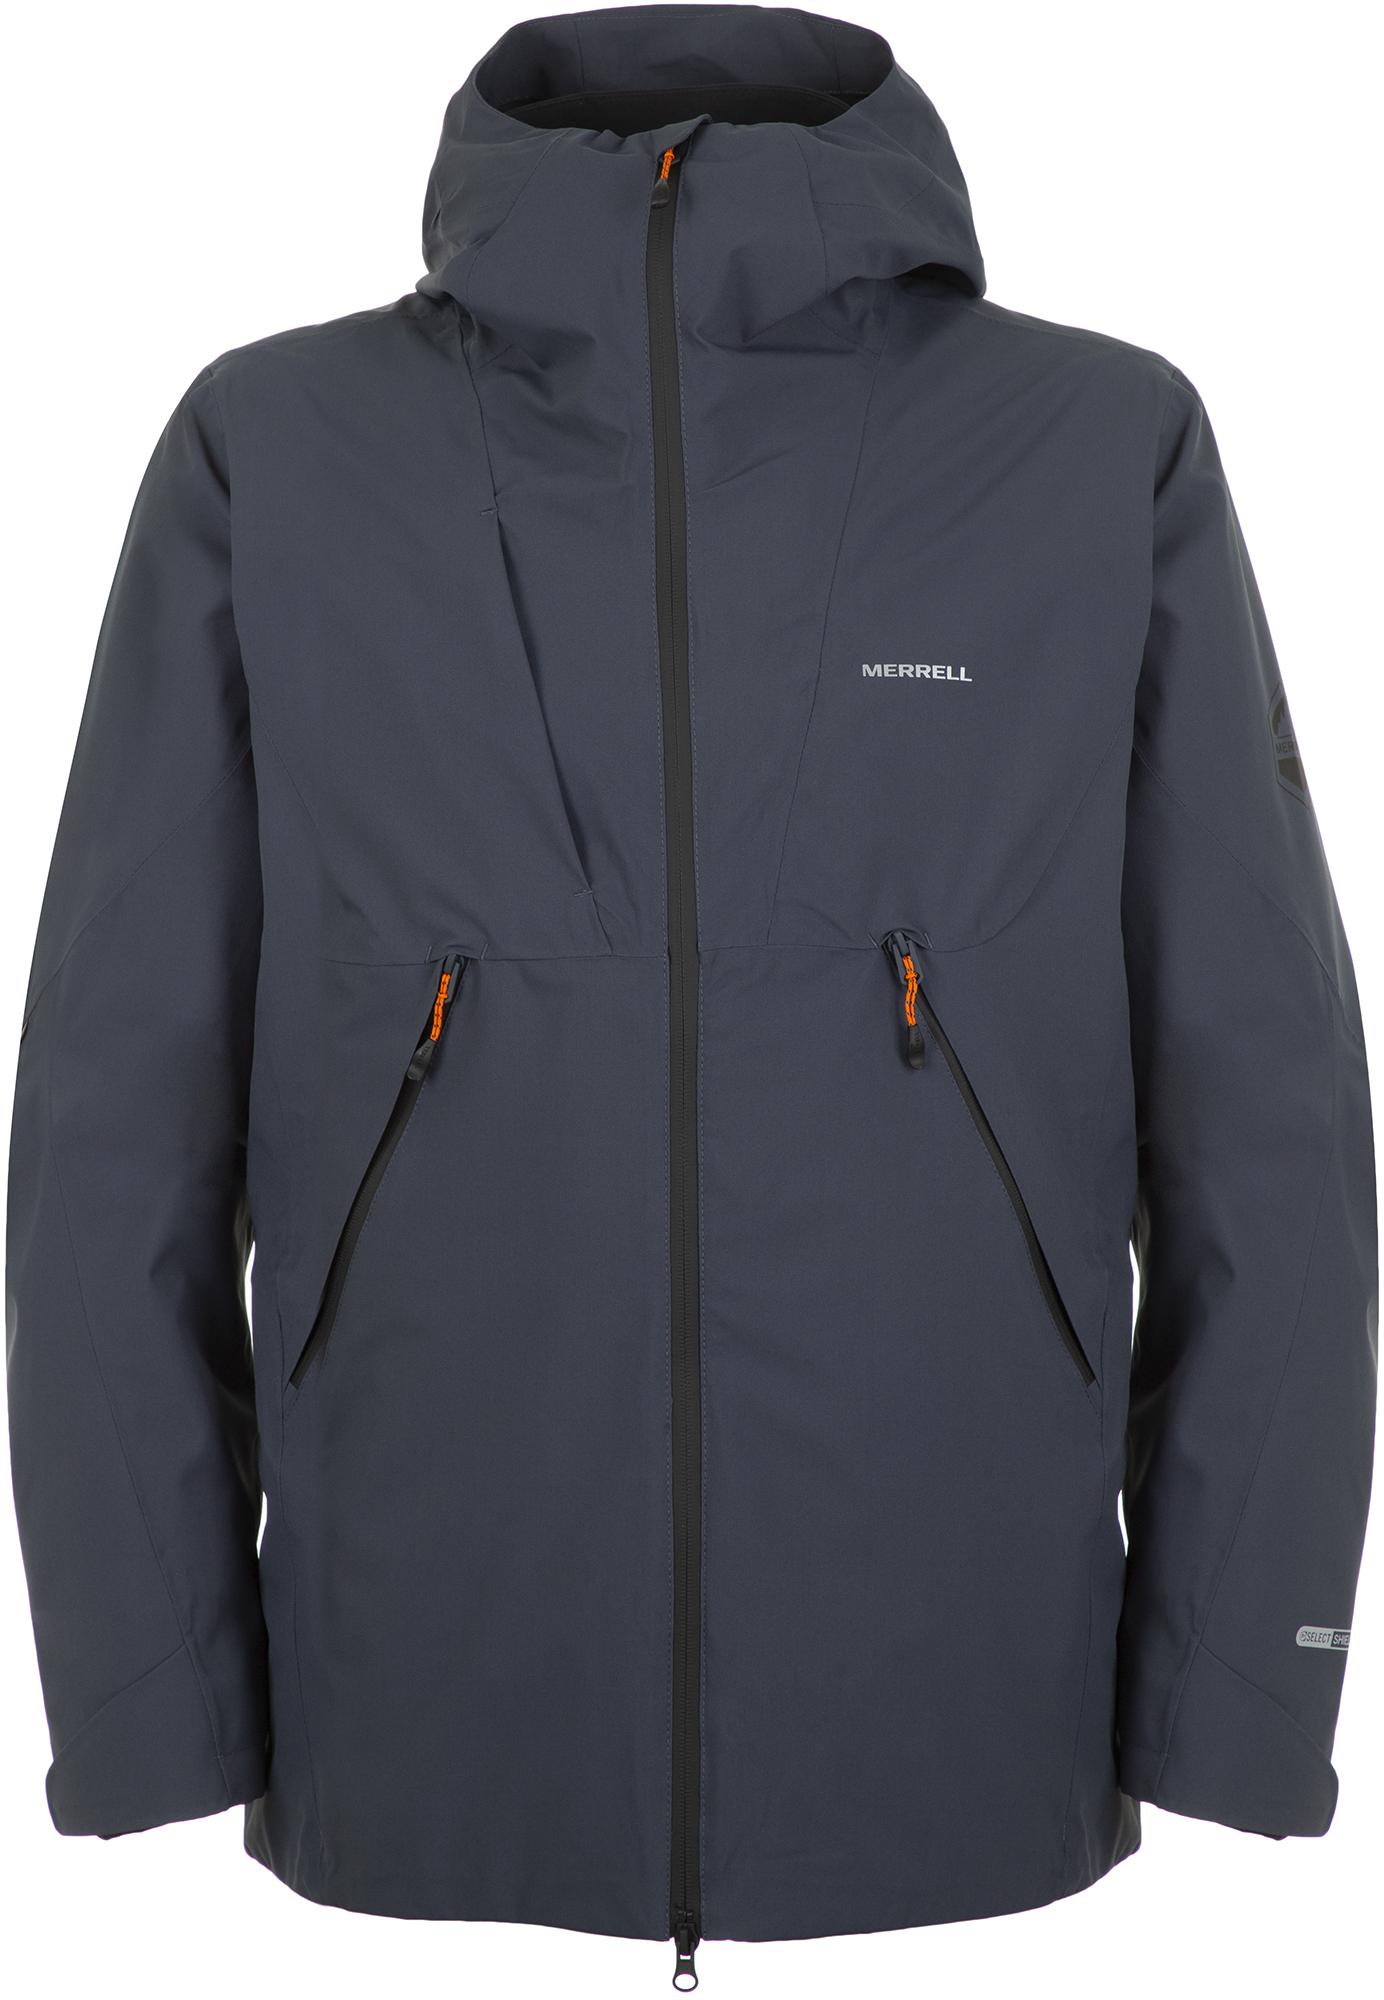 купить Merrell Куртка утепленная мужская Merrell, размер 54 по цене 9799 рублей